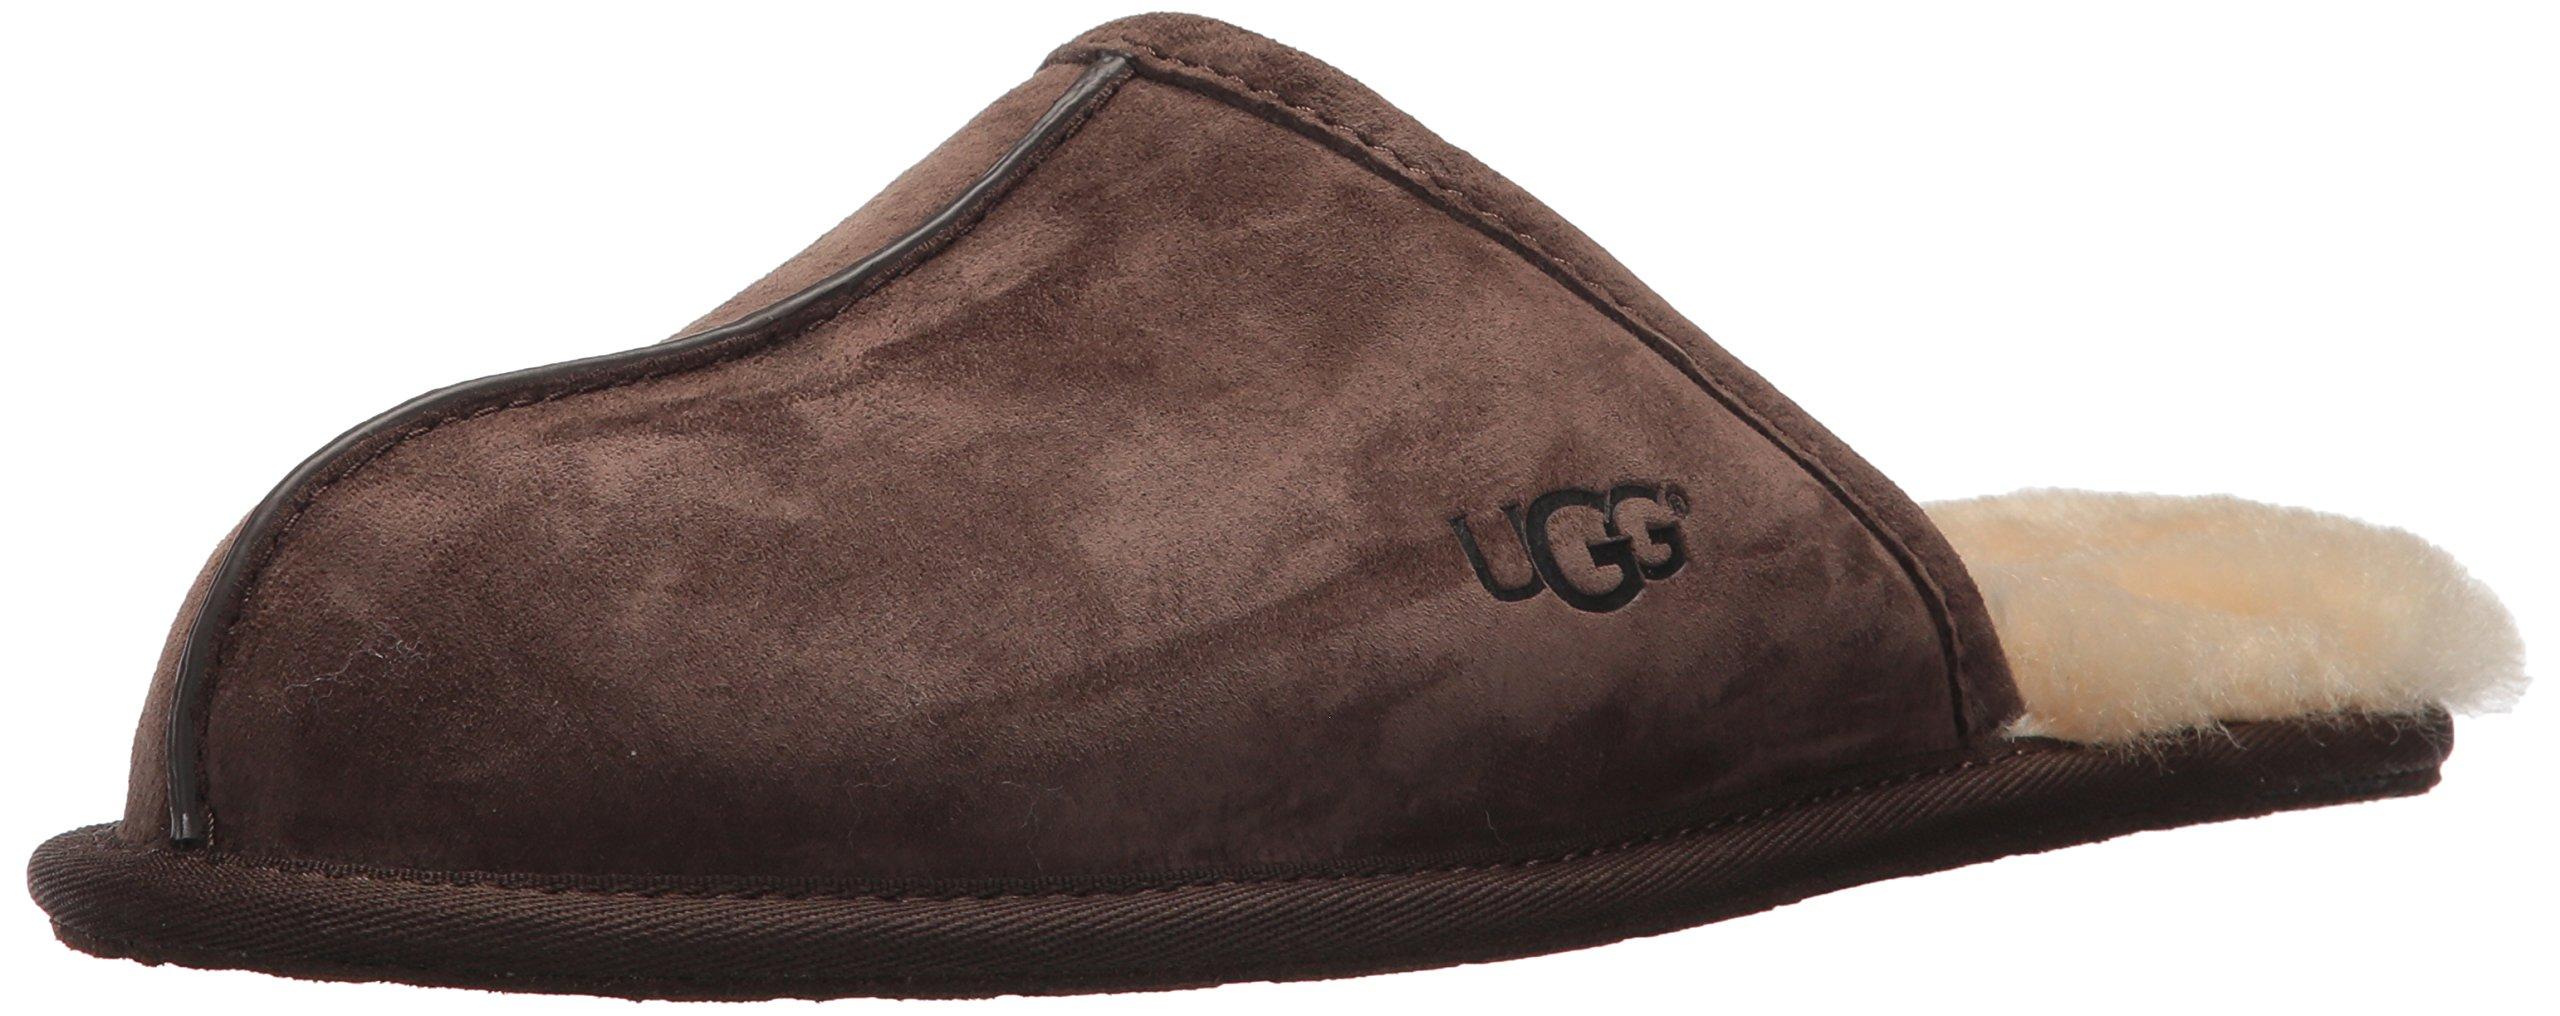 UGG Men's Scuff Slipper, Espresso, 11 US/11 M US by UGG